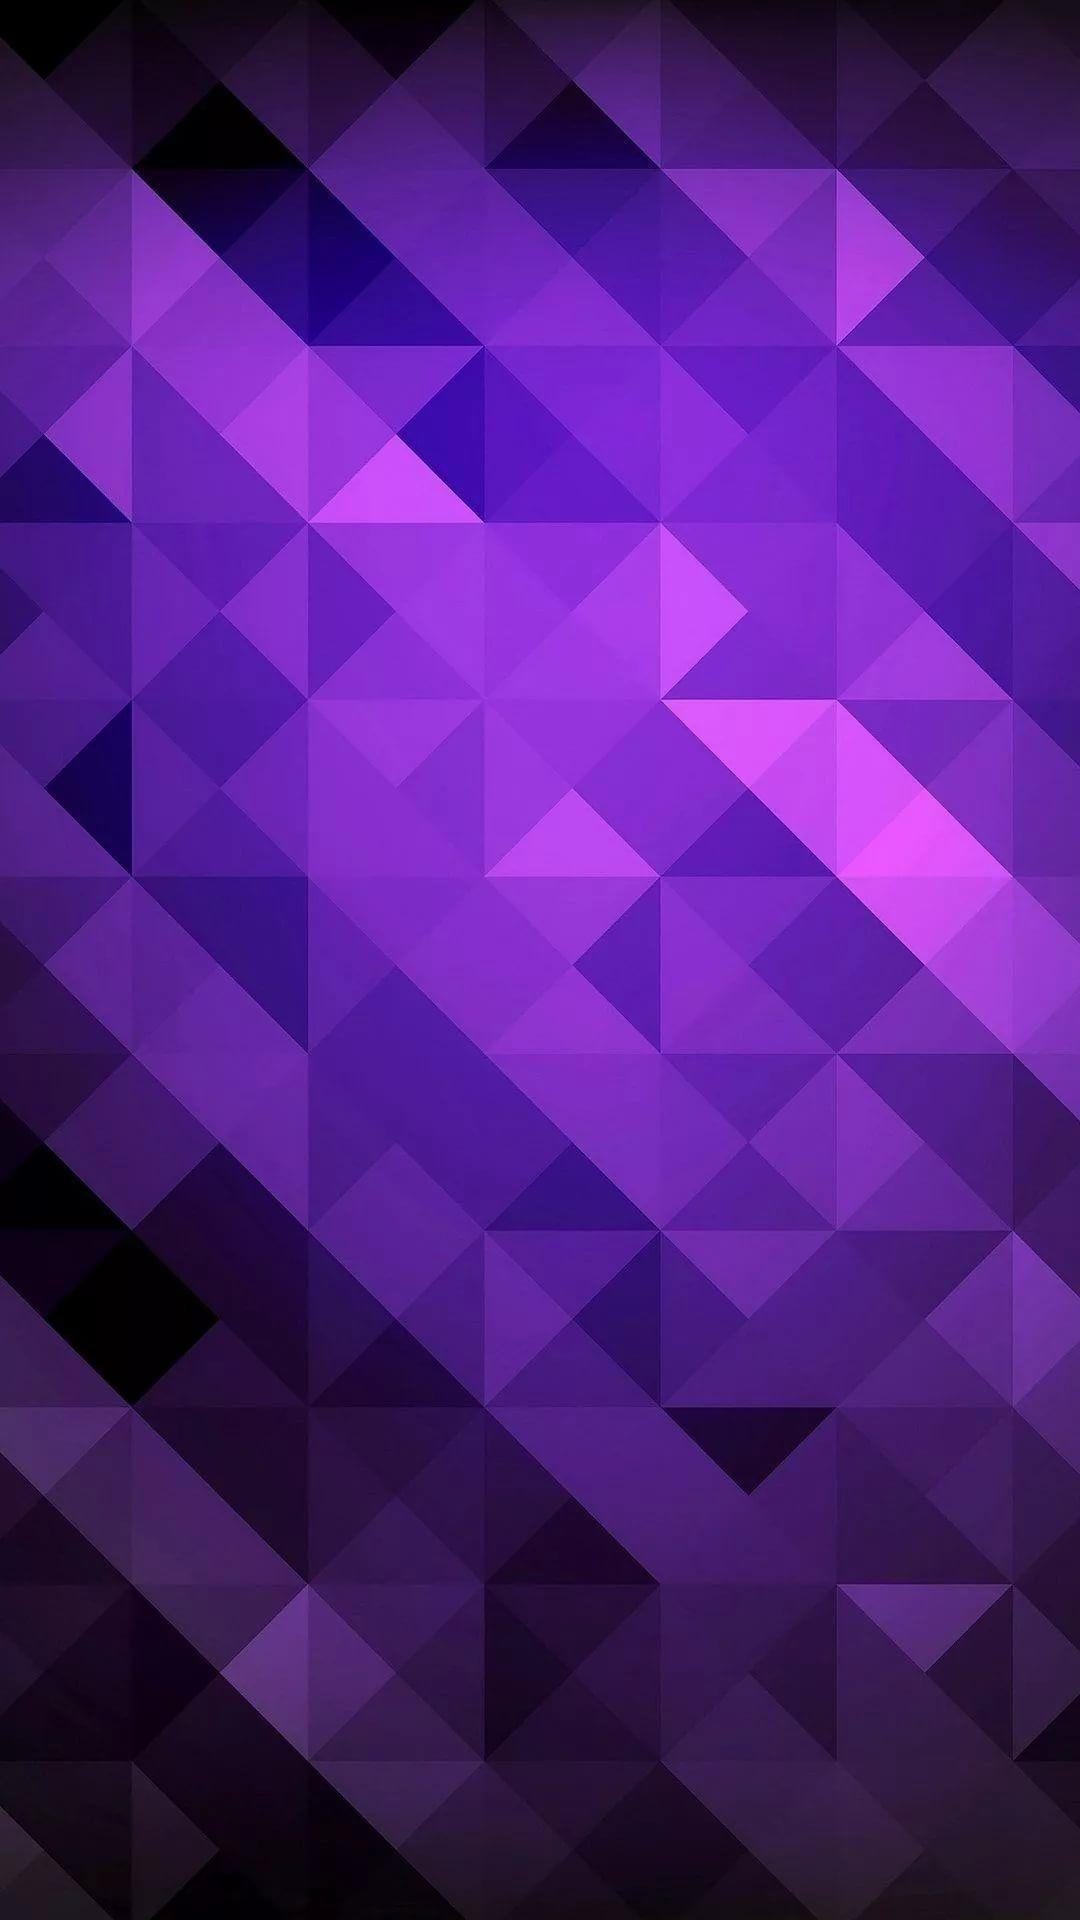 Purple iPhone 5 wallpaper